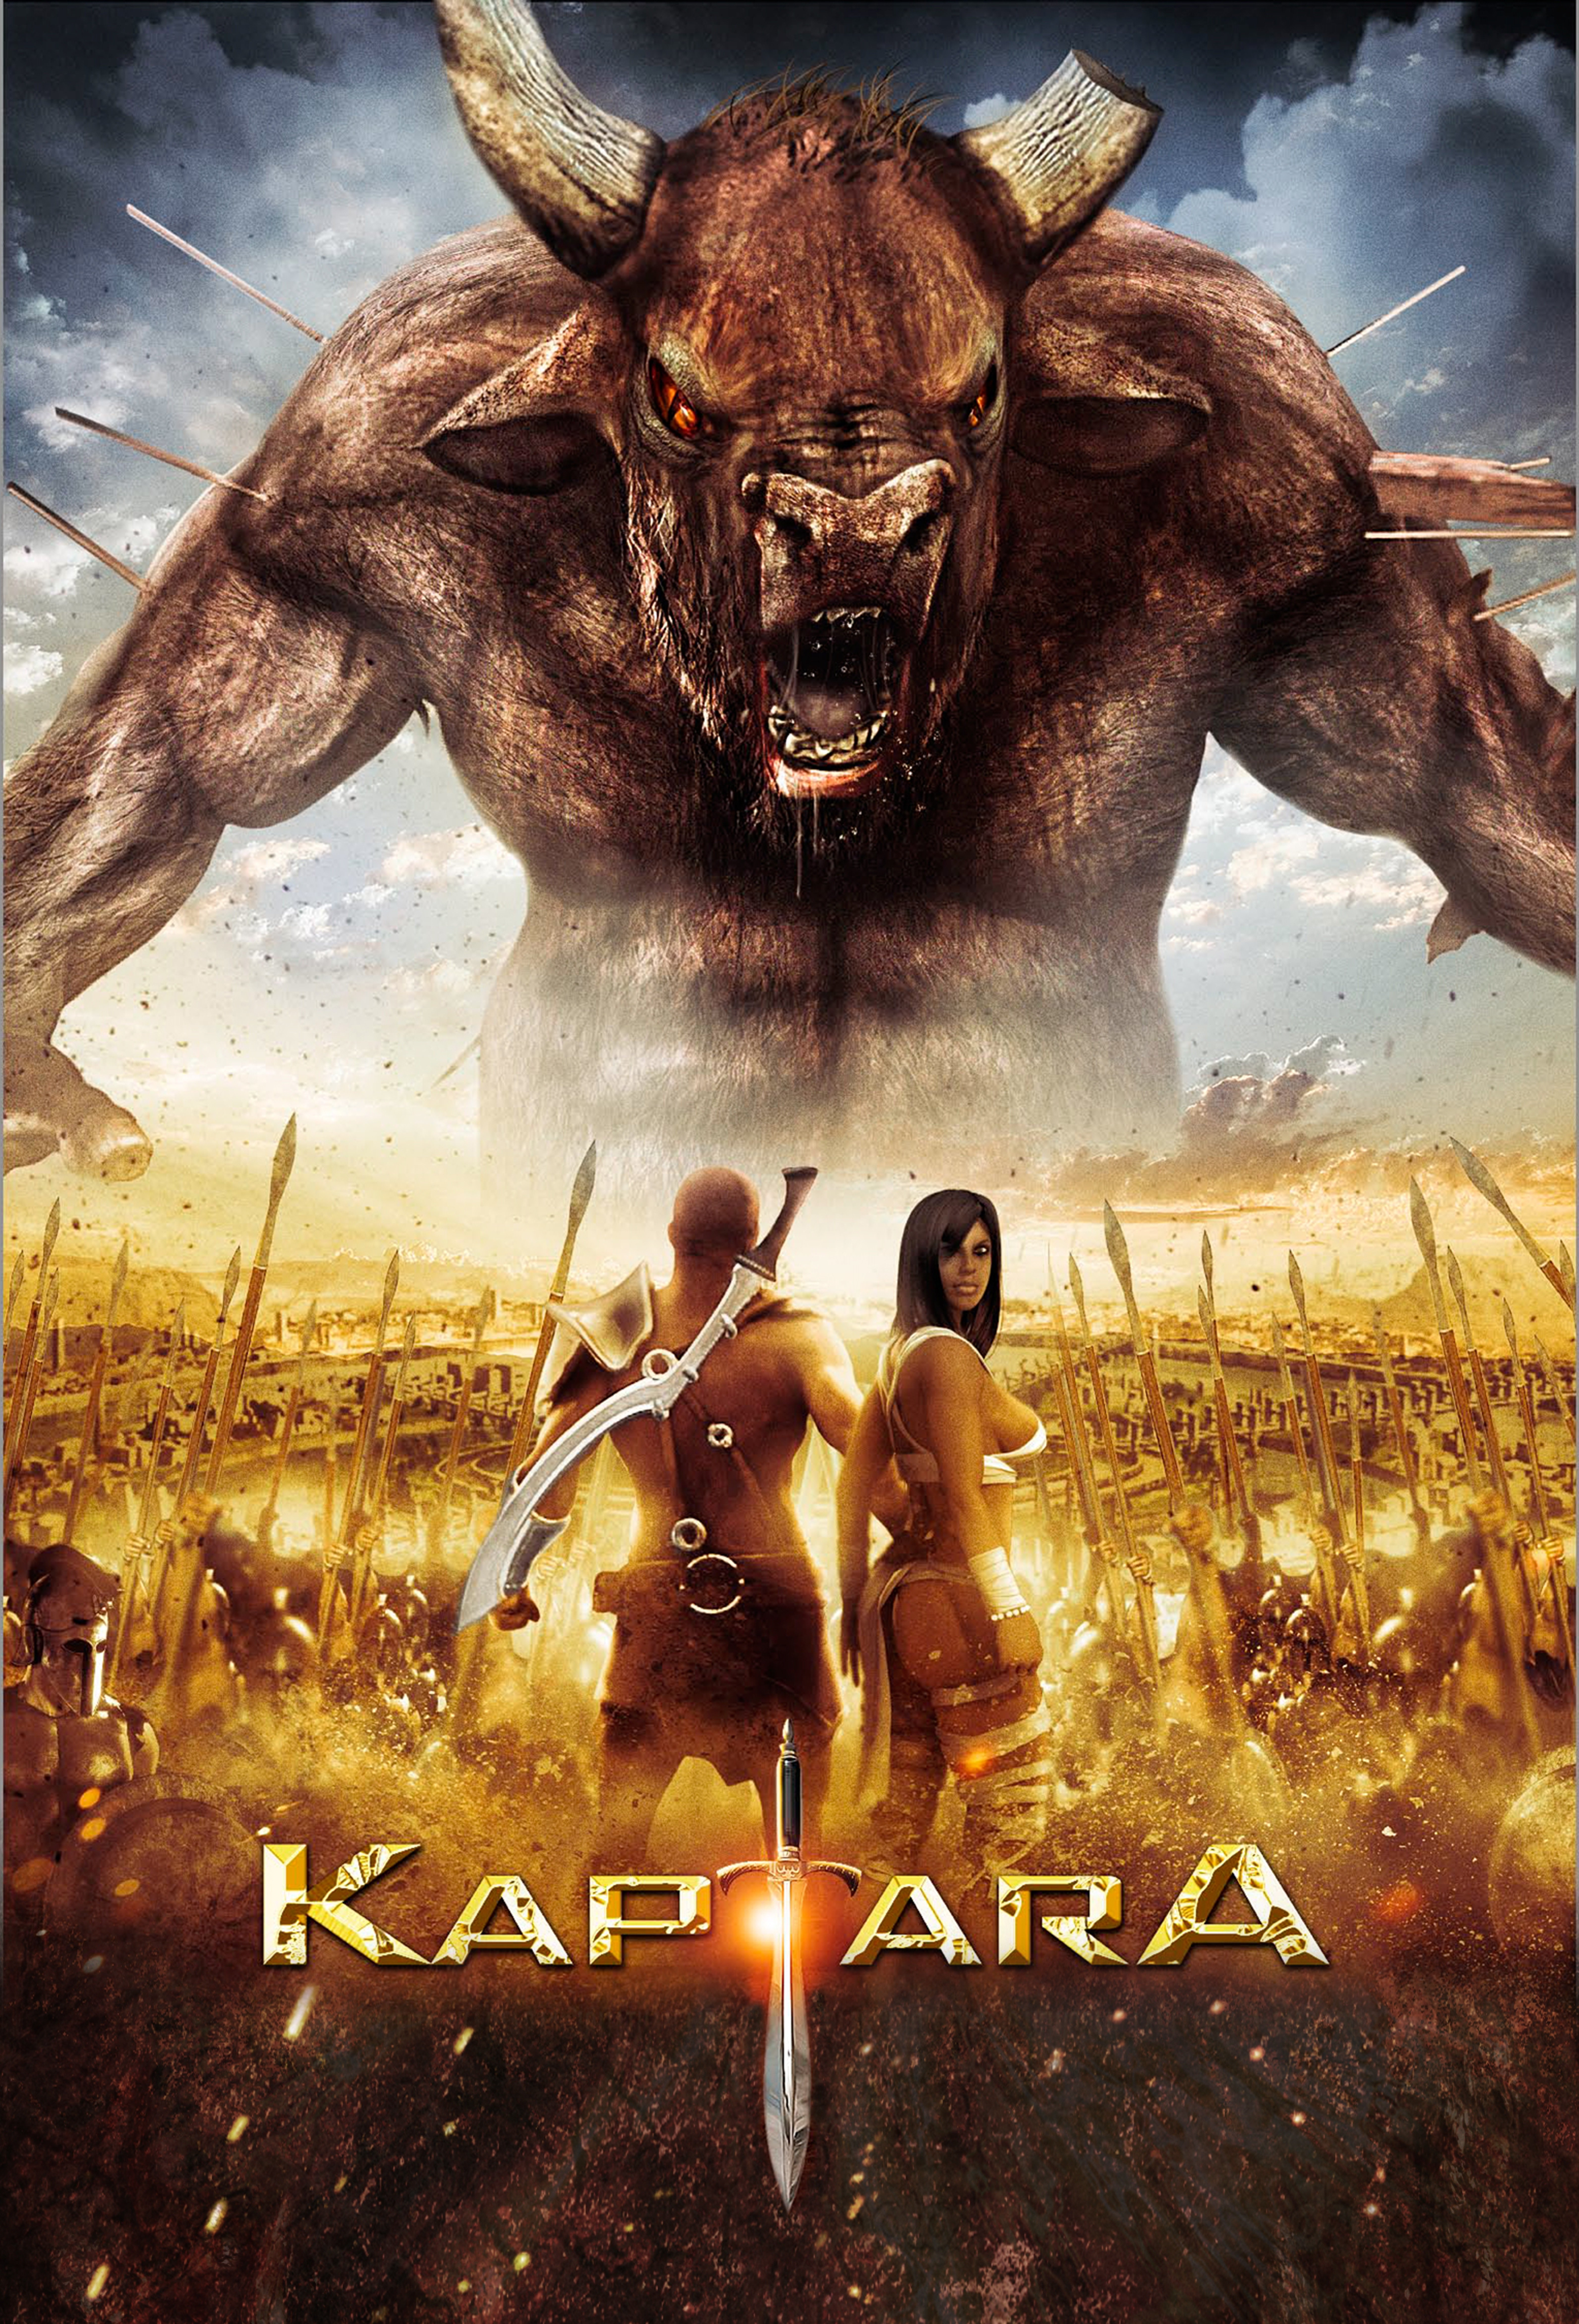 image Atlantis: The Last Days of Kaptara Watch Full Movie Free Online